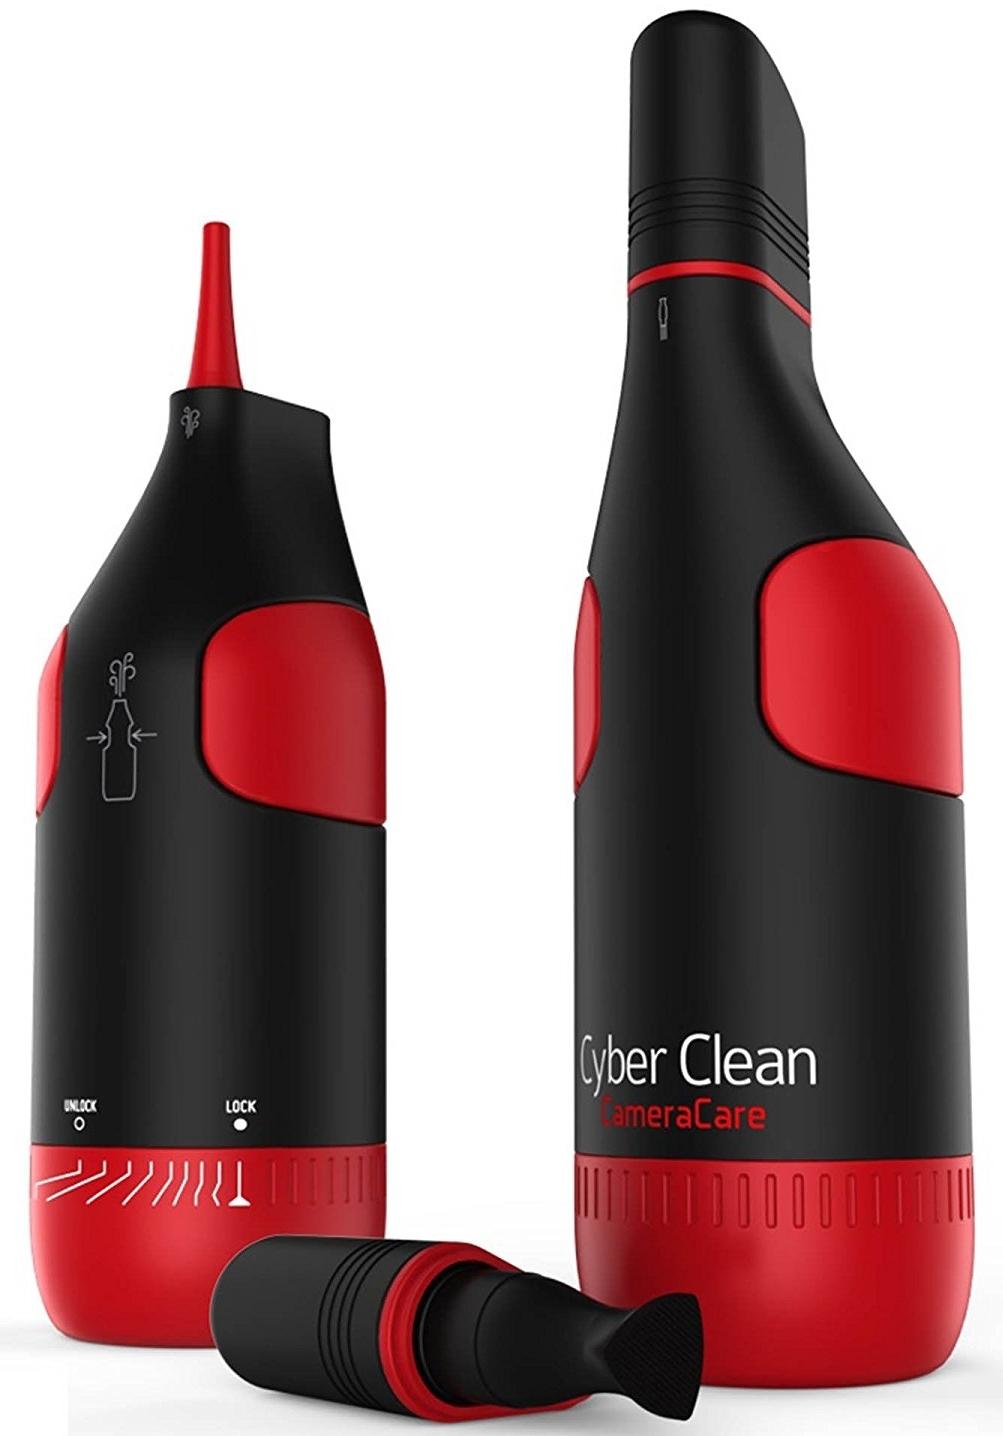 CYBERCLEAN čistící sada Starter Pack